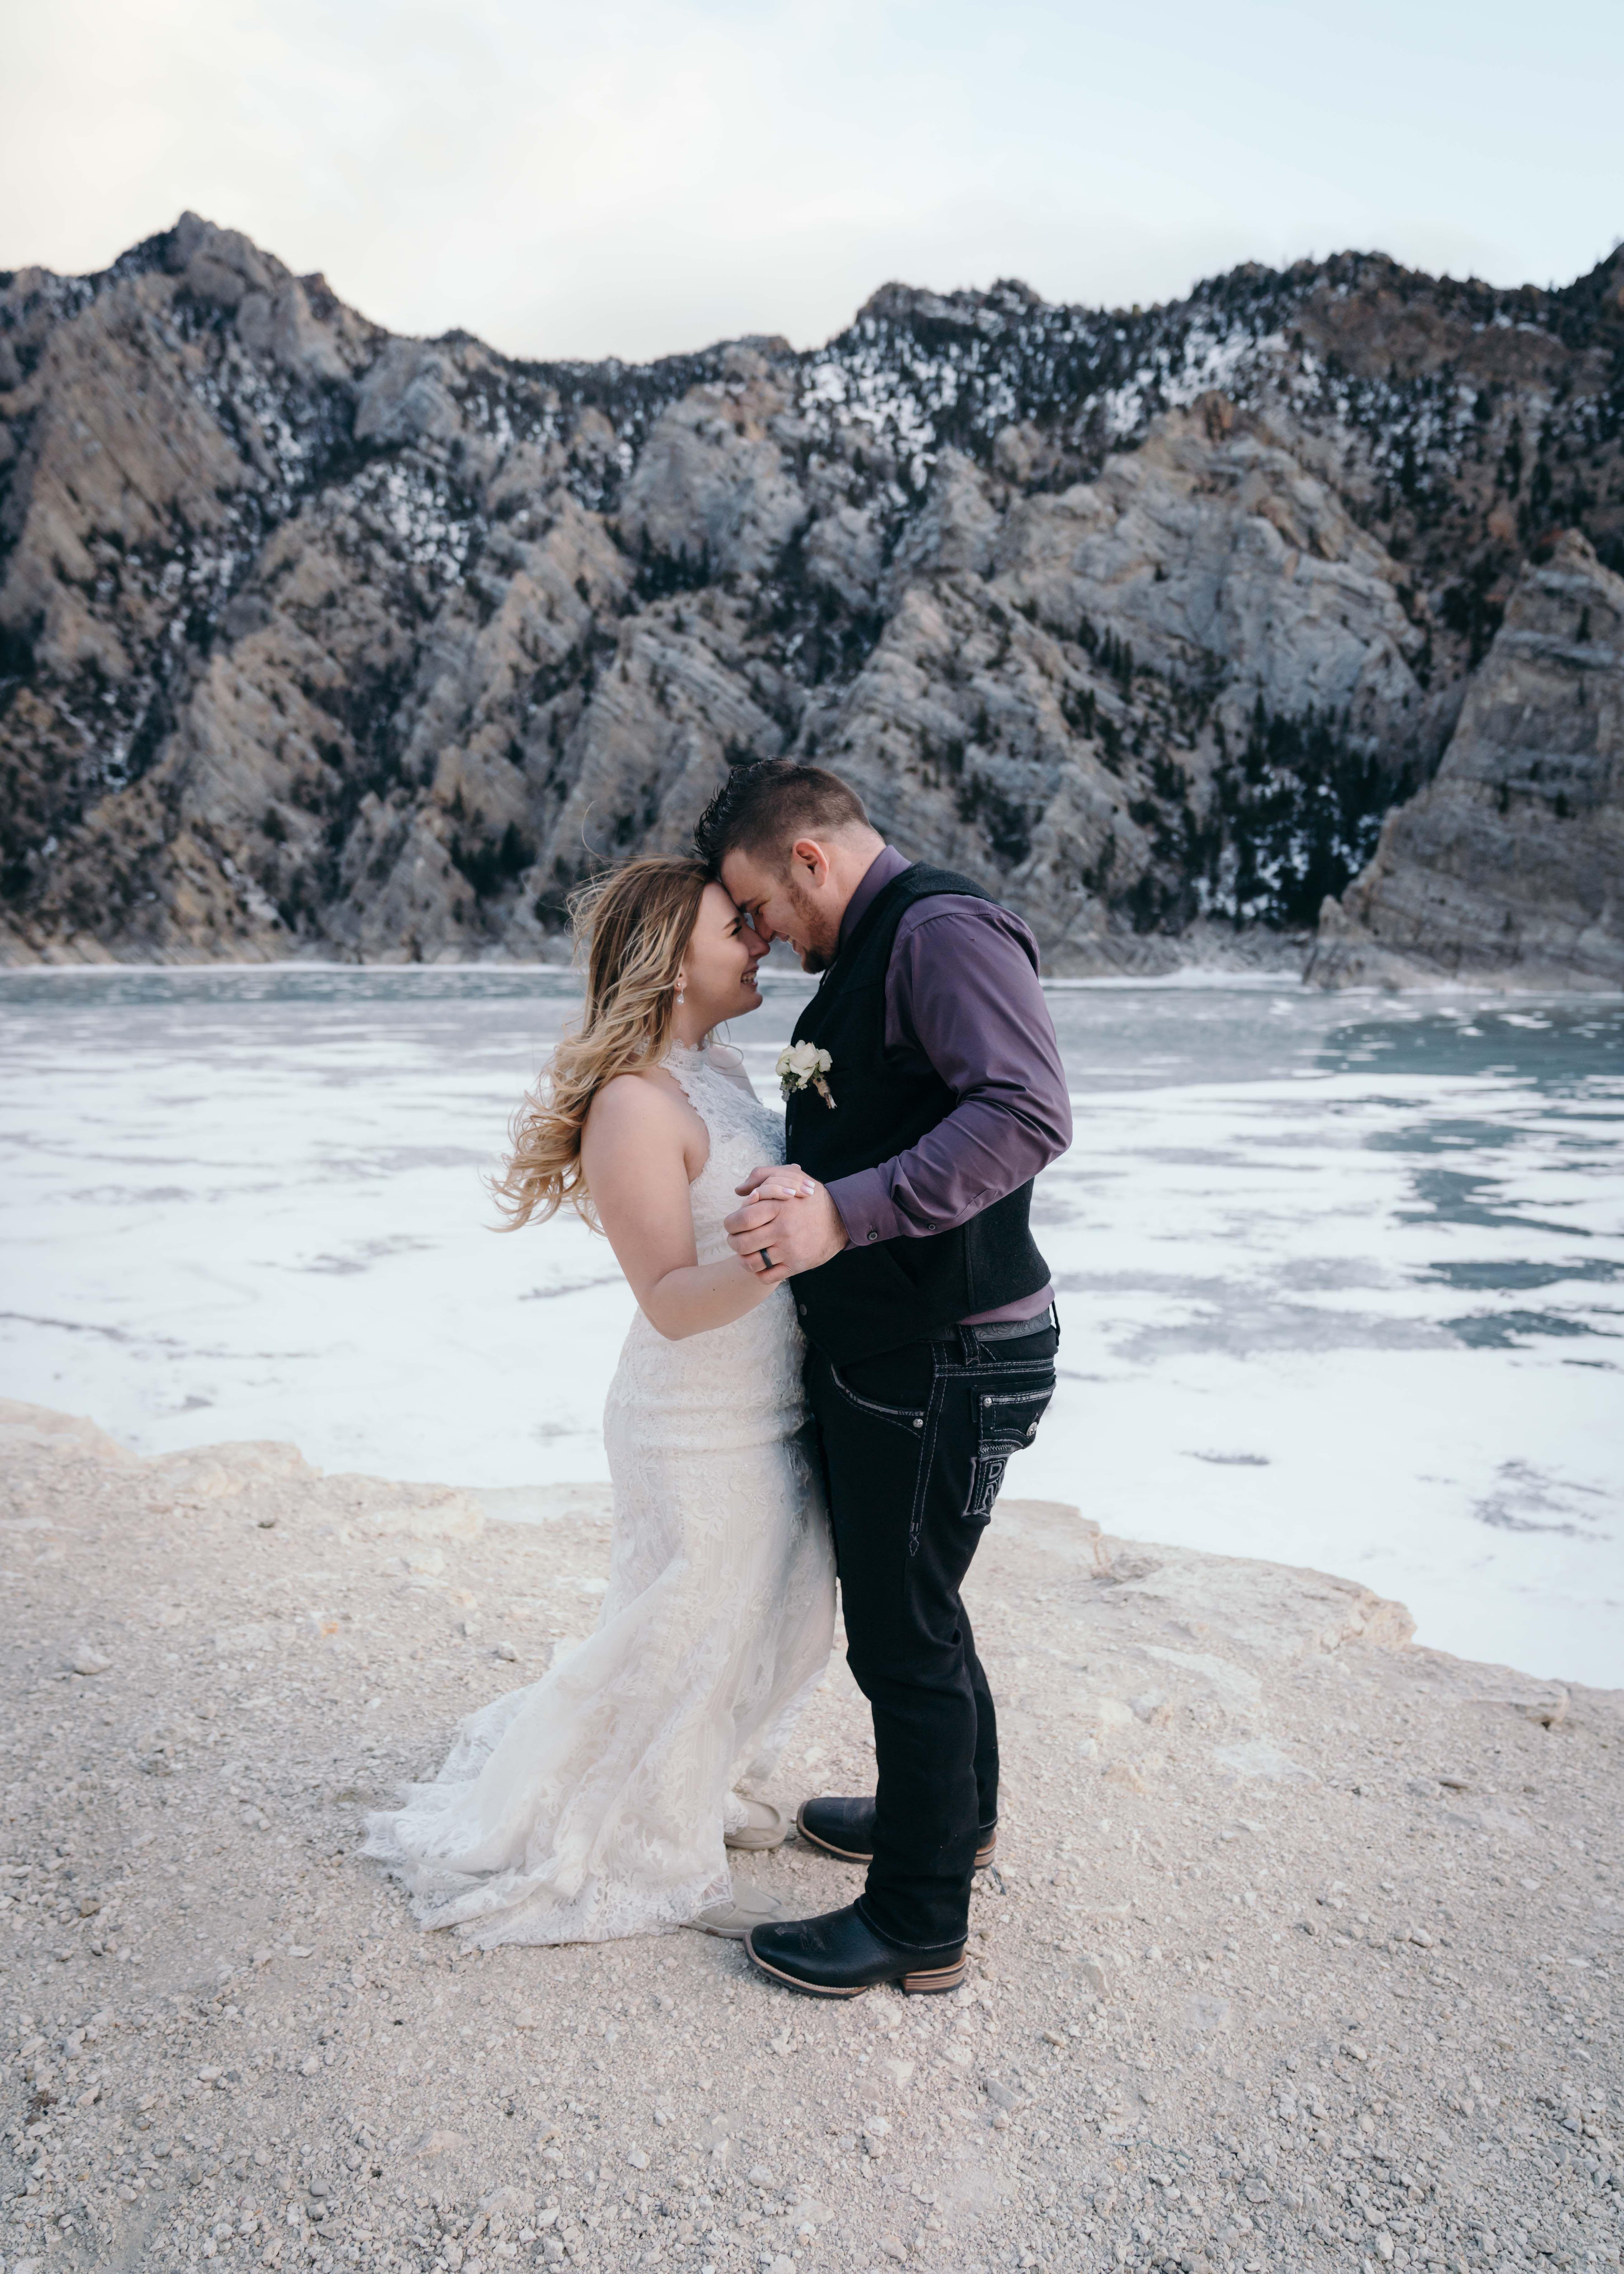 Buffalo Bill Reservoir Backdrop For This Winter Wedding In Cody Wyoming West Yellowstone Grand Teton National Park Teton National Park